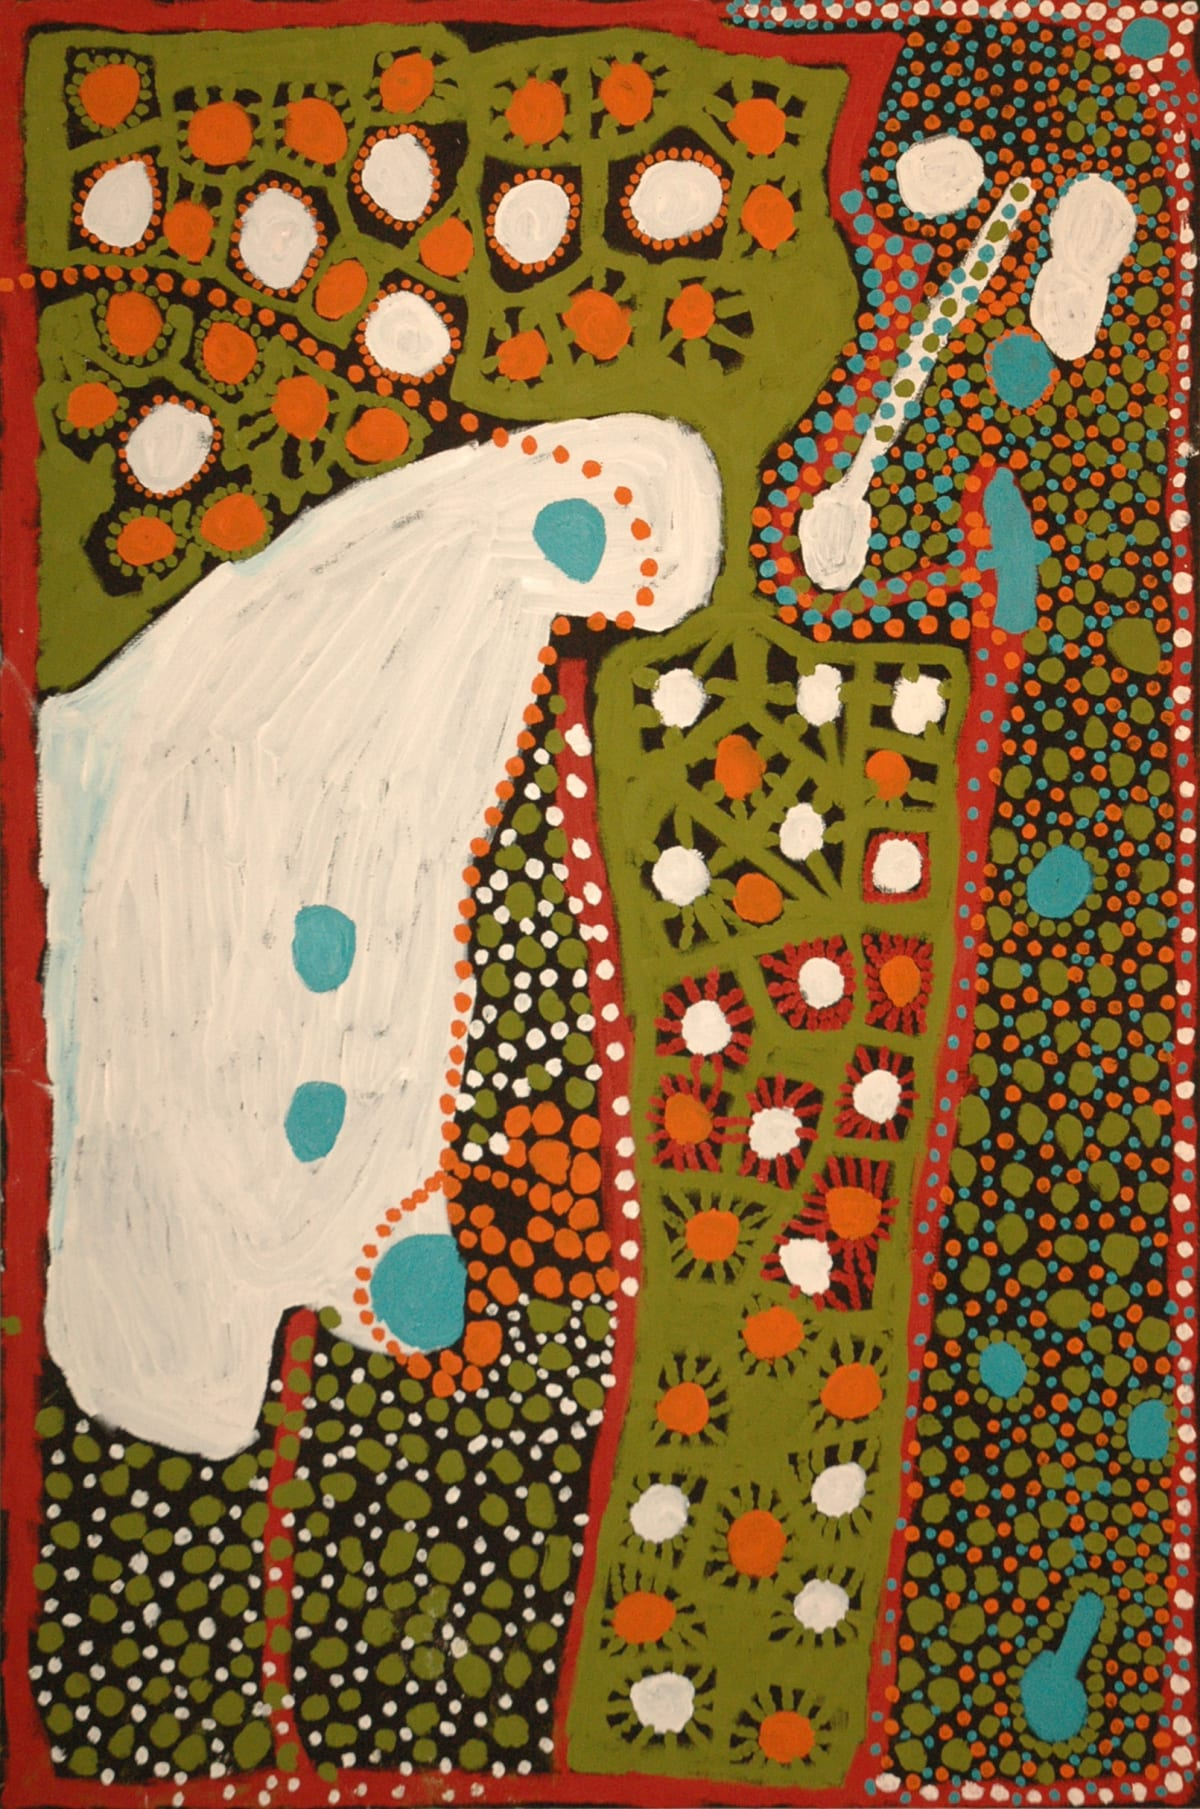 Weaver Jack Winpa acrylic on linen 110 x 165 cm